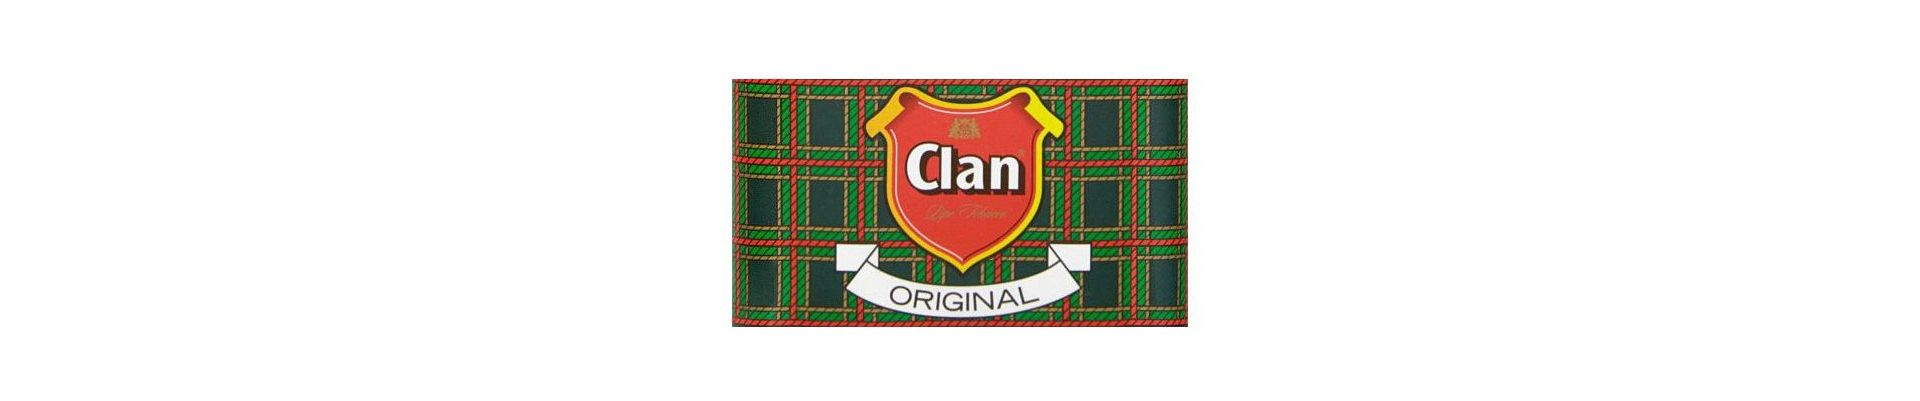 Tutun pentru pipa Clan si accesorii pentru pipa Clan Aromatic.Magazin tutun de pipa.